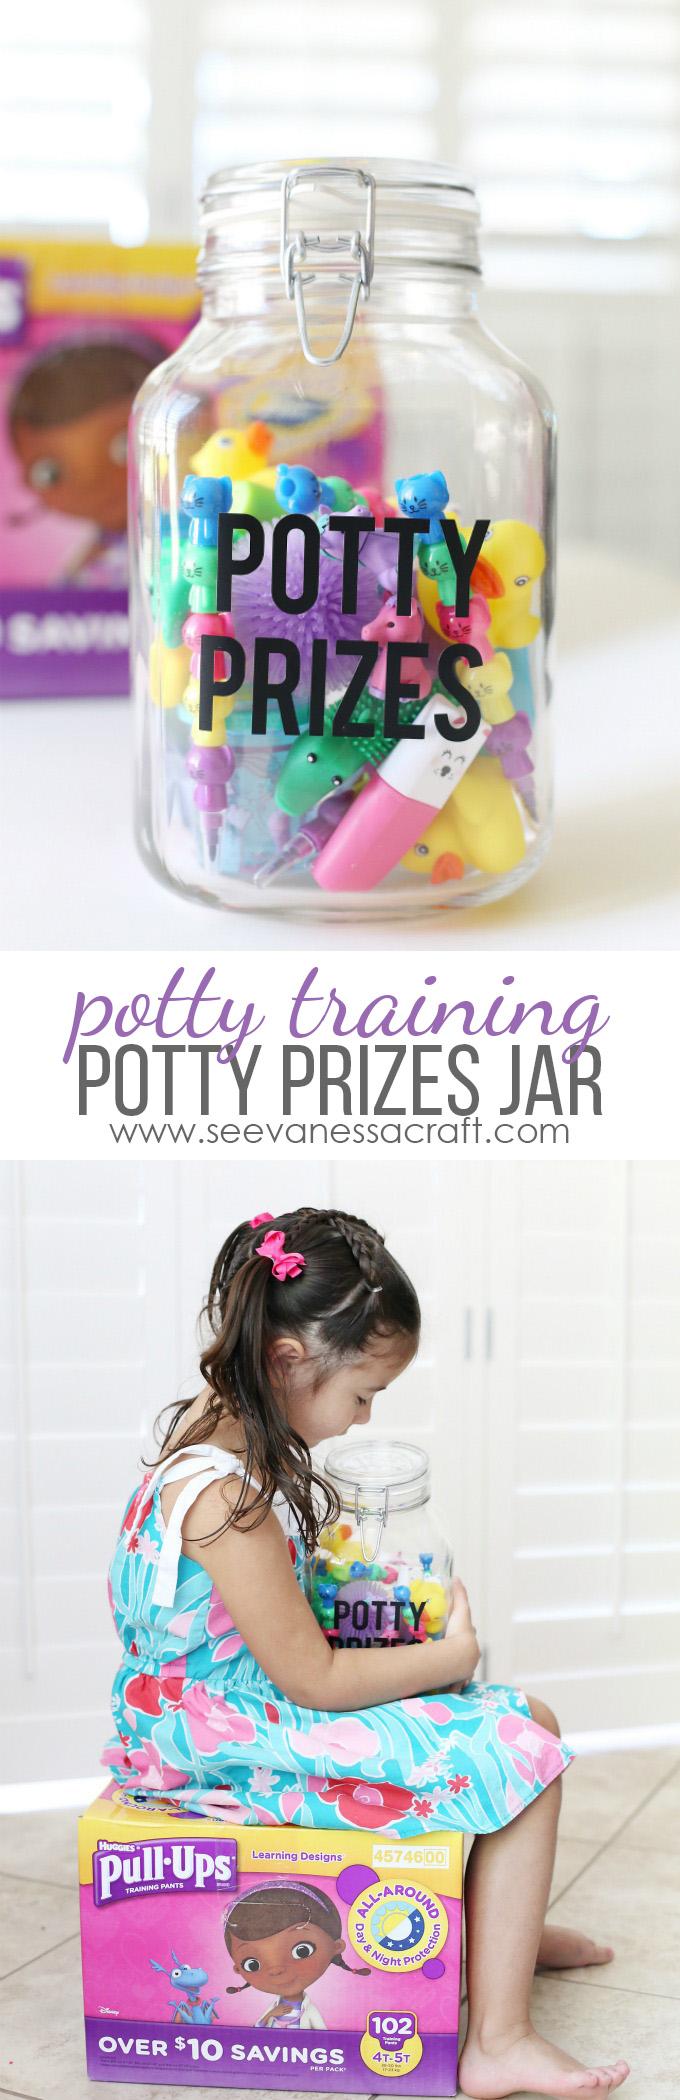 Potty Prizes Jar for Potty Training copy